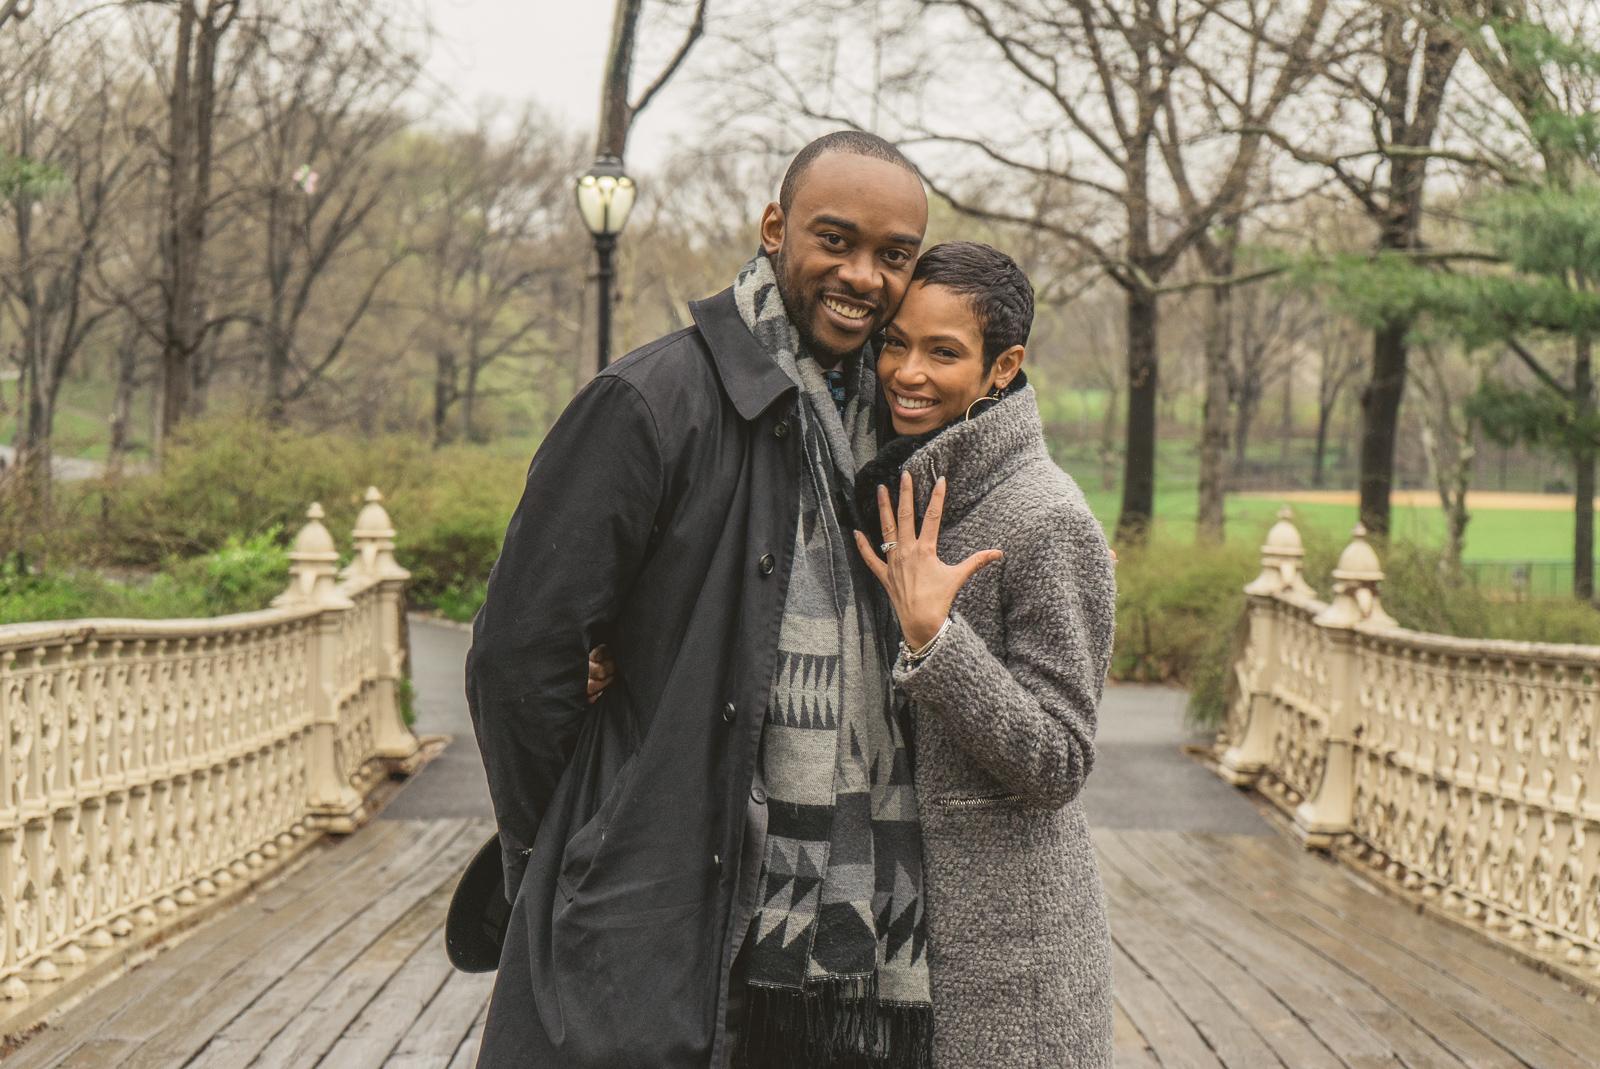 Photo 17 Pine Bank bridge Central Park Marriage Proposal | VladLeto